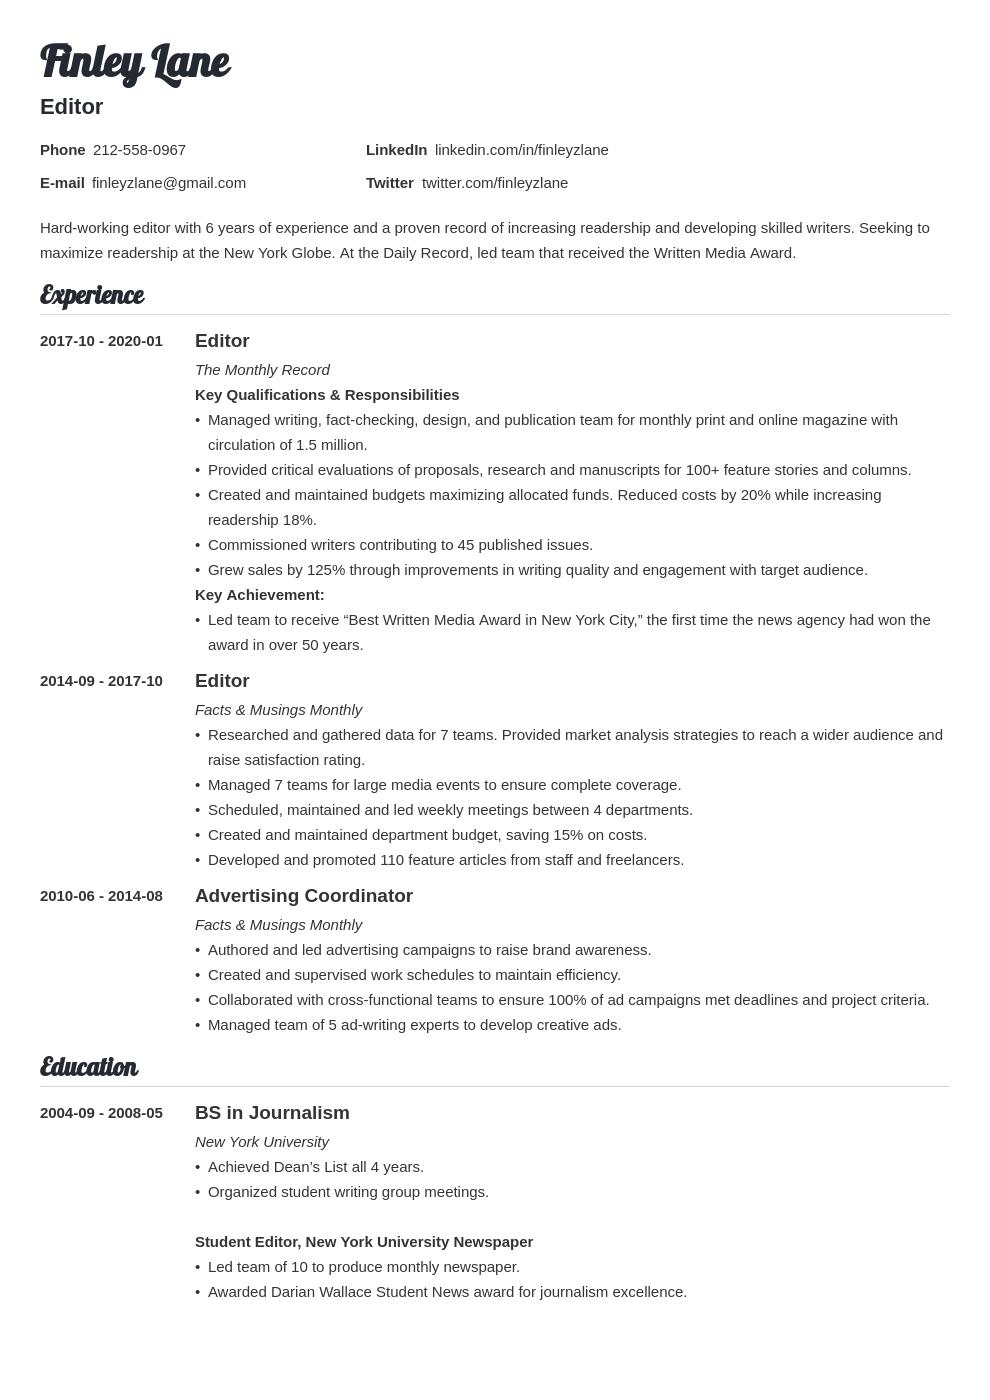 Editor Resume Example Template Valera Resume Examples Job Resume Examples Guided Writing